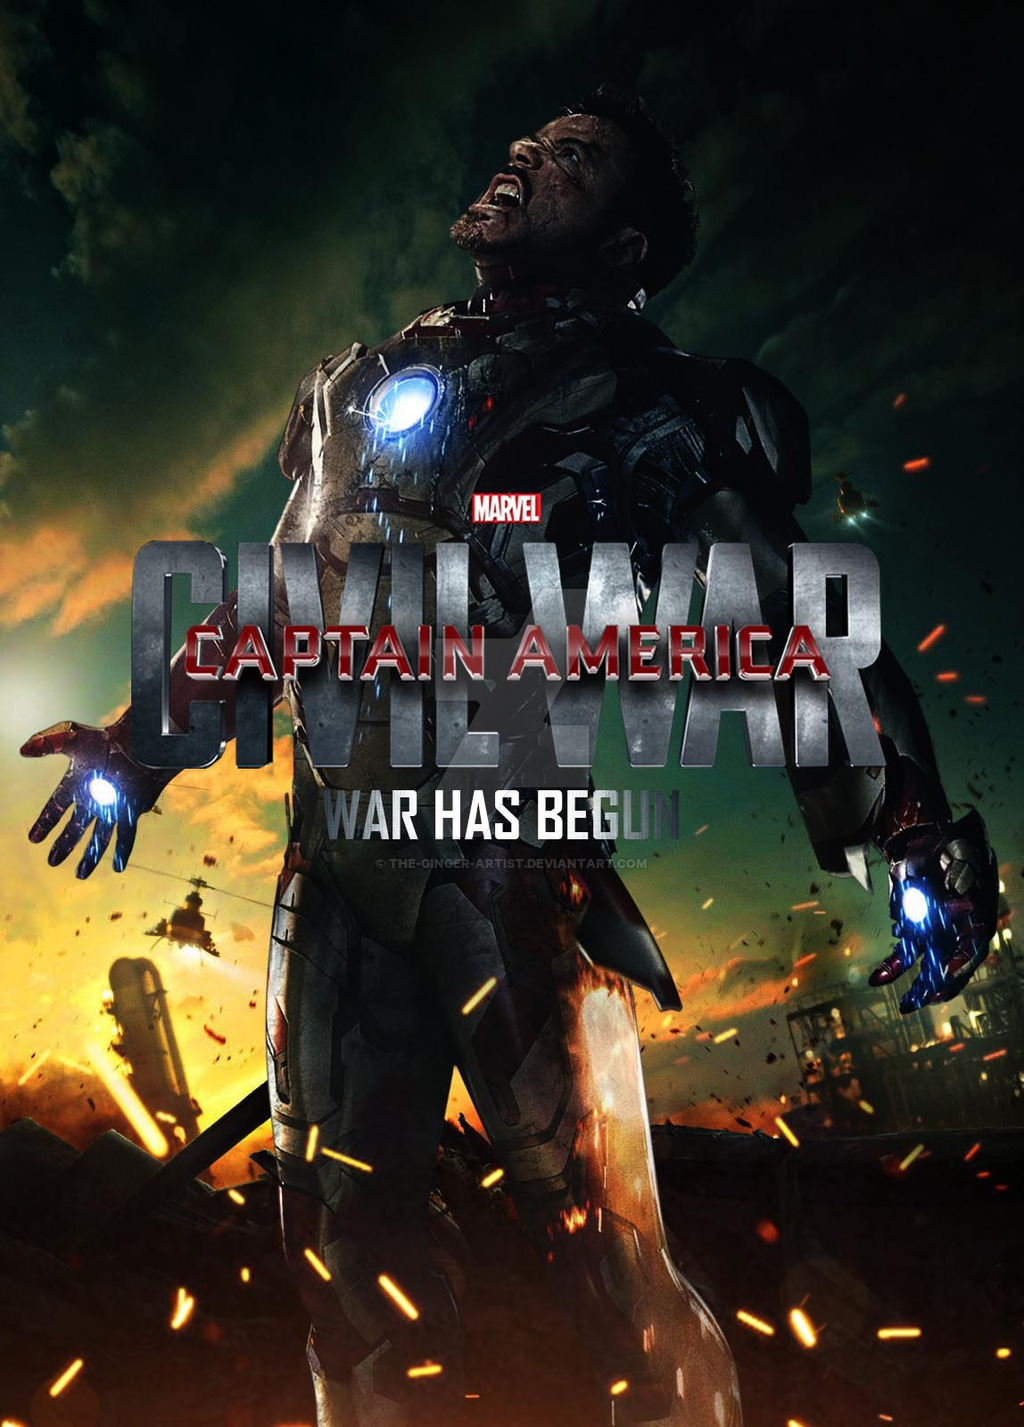 HD Images 1080p Captain America Civil War HD Wallpapers 1024x1427